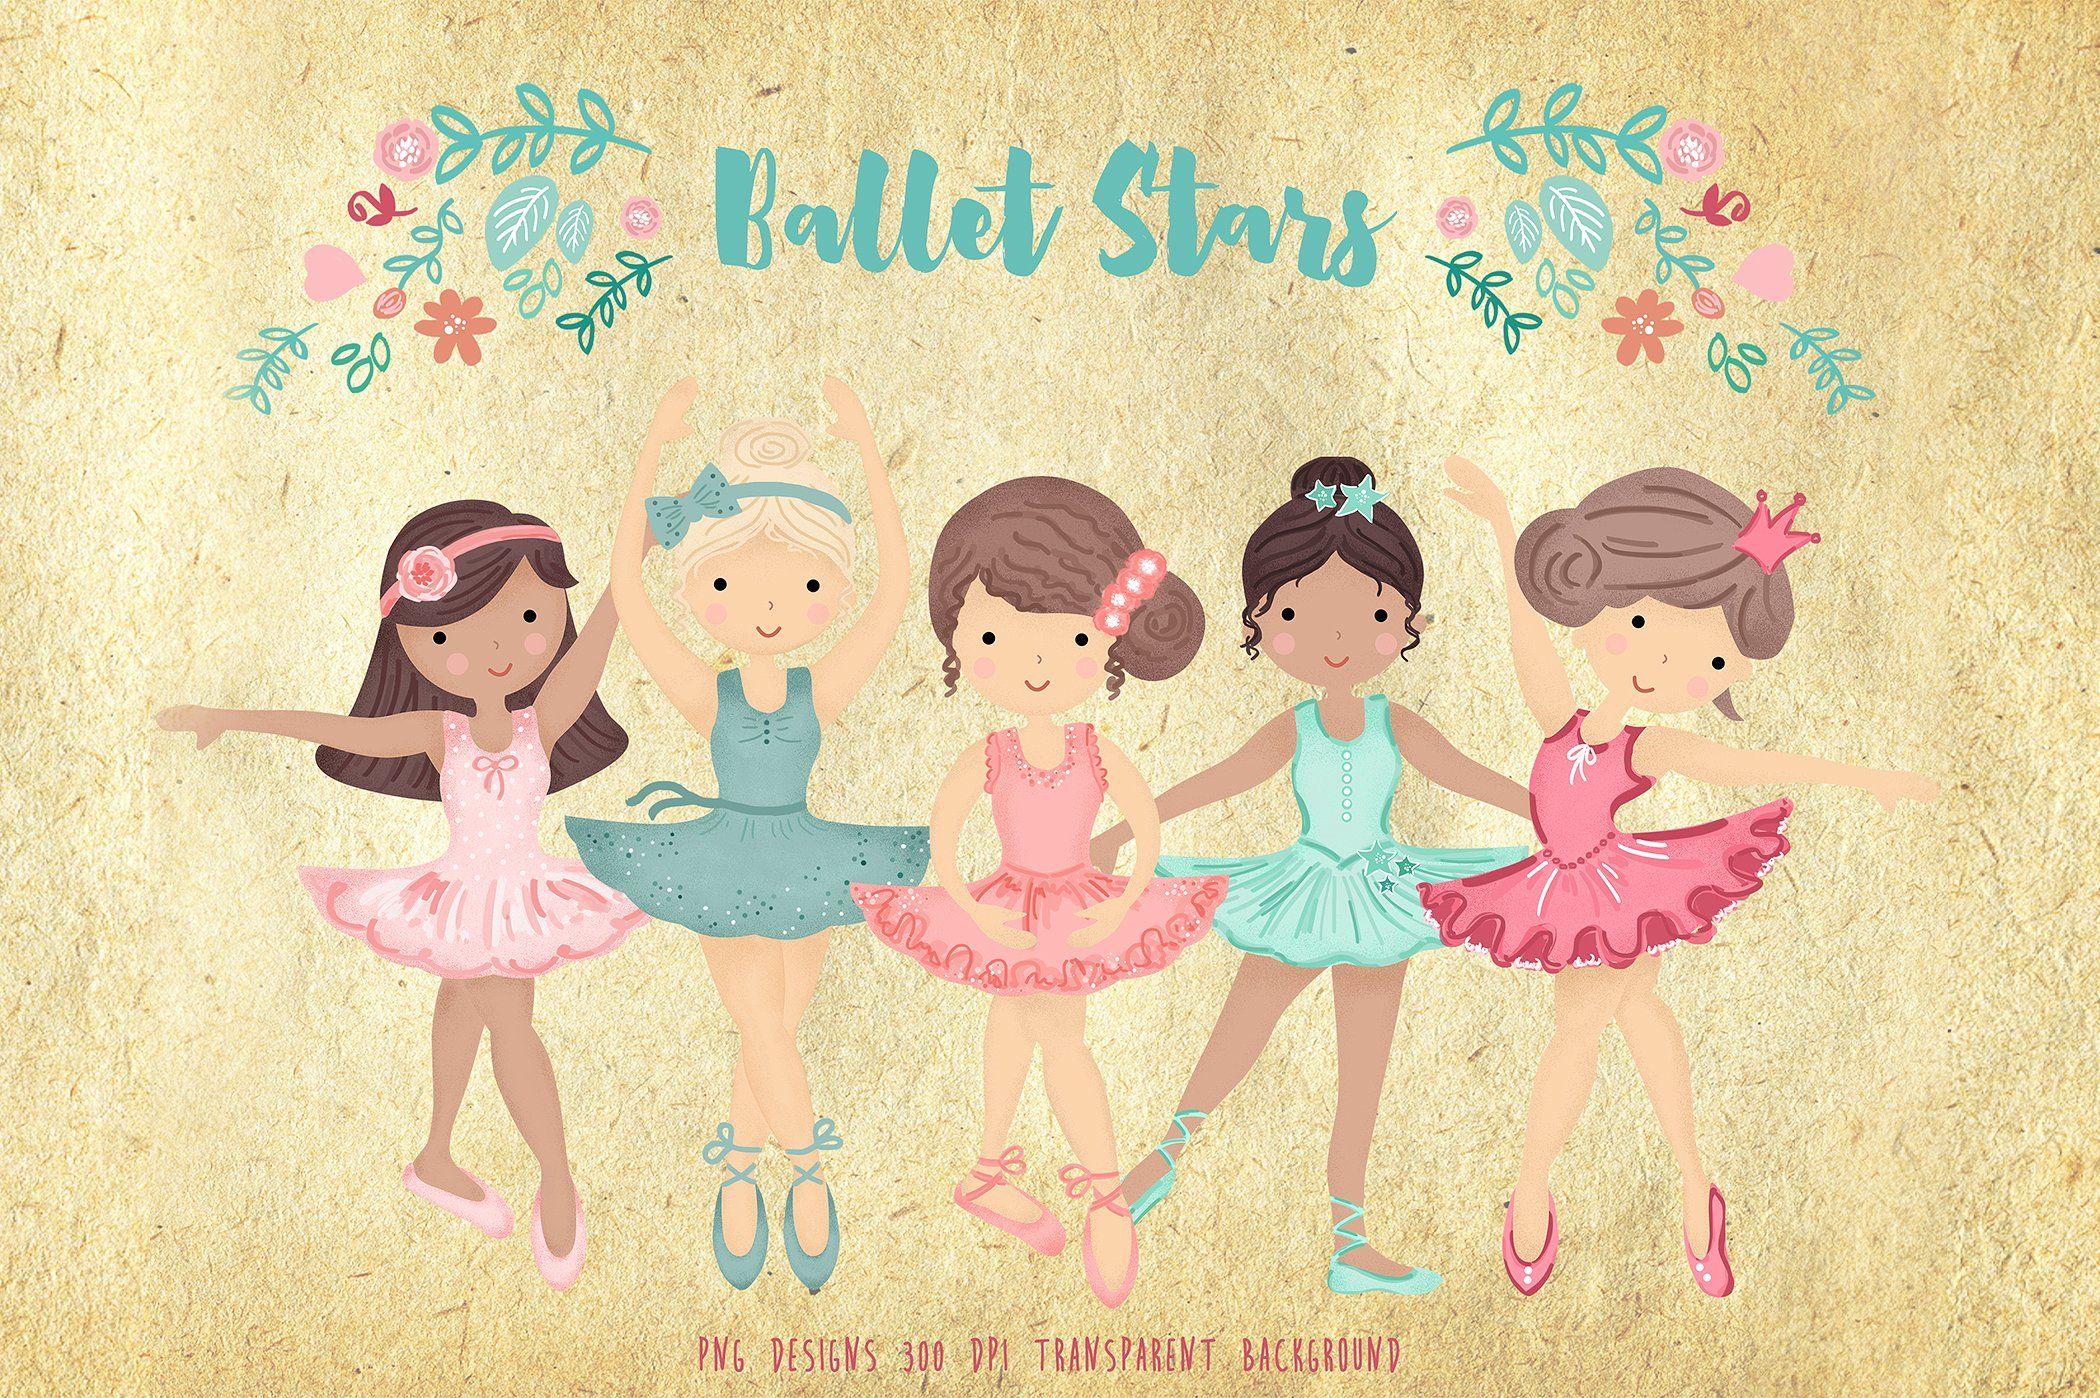 Ballerina Ballet Dancers Clipart by EasyPrint PD on.